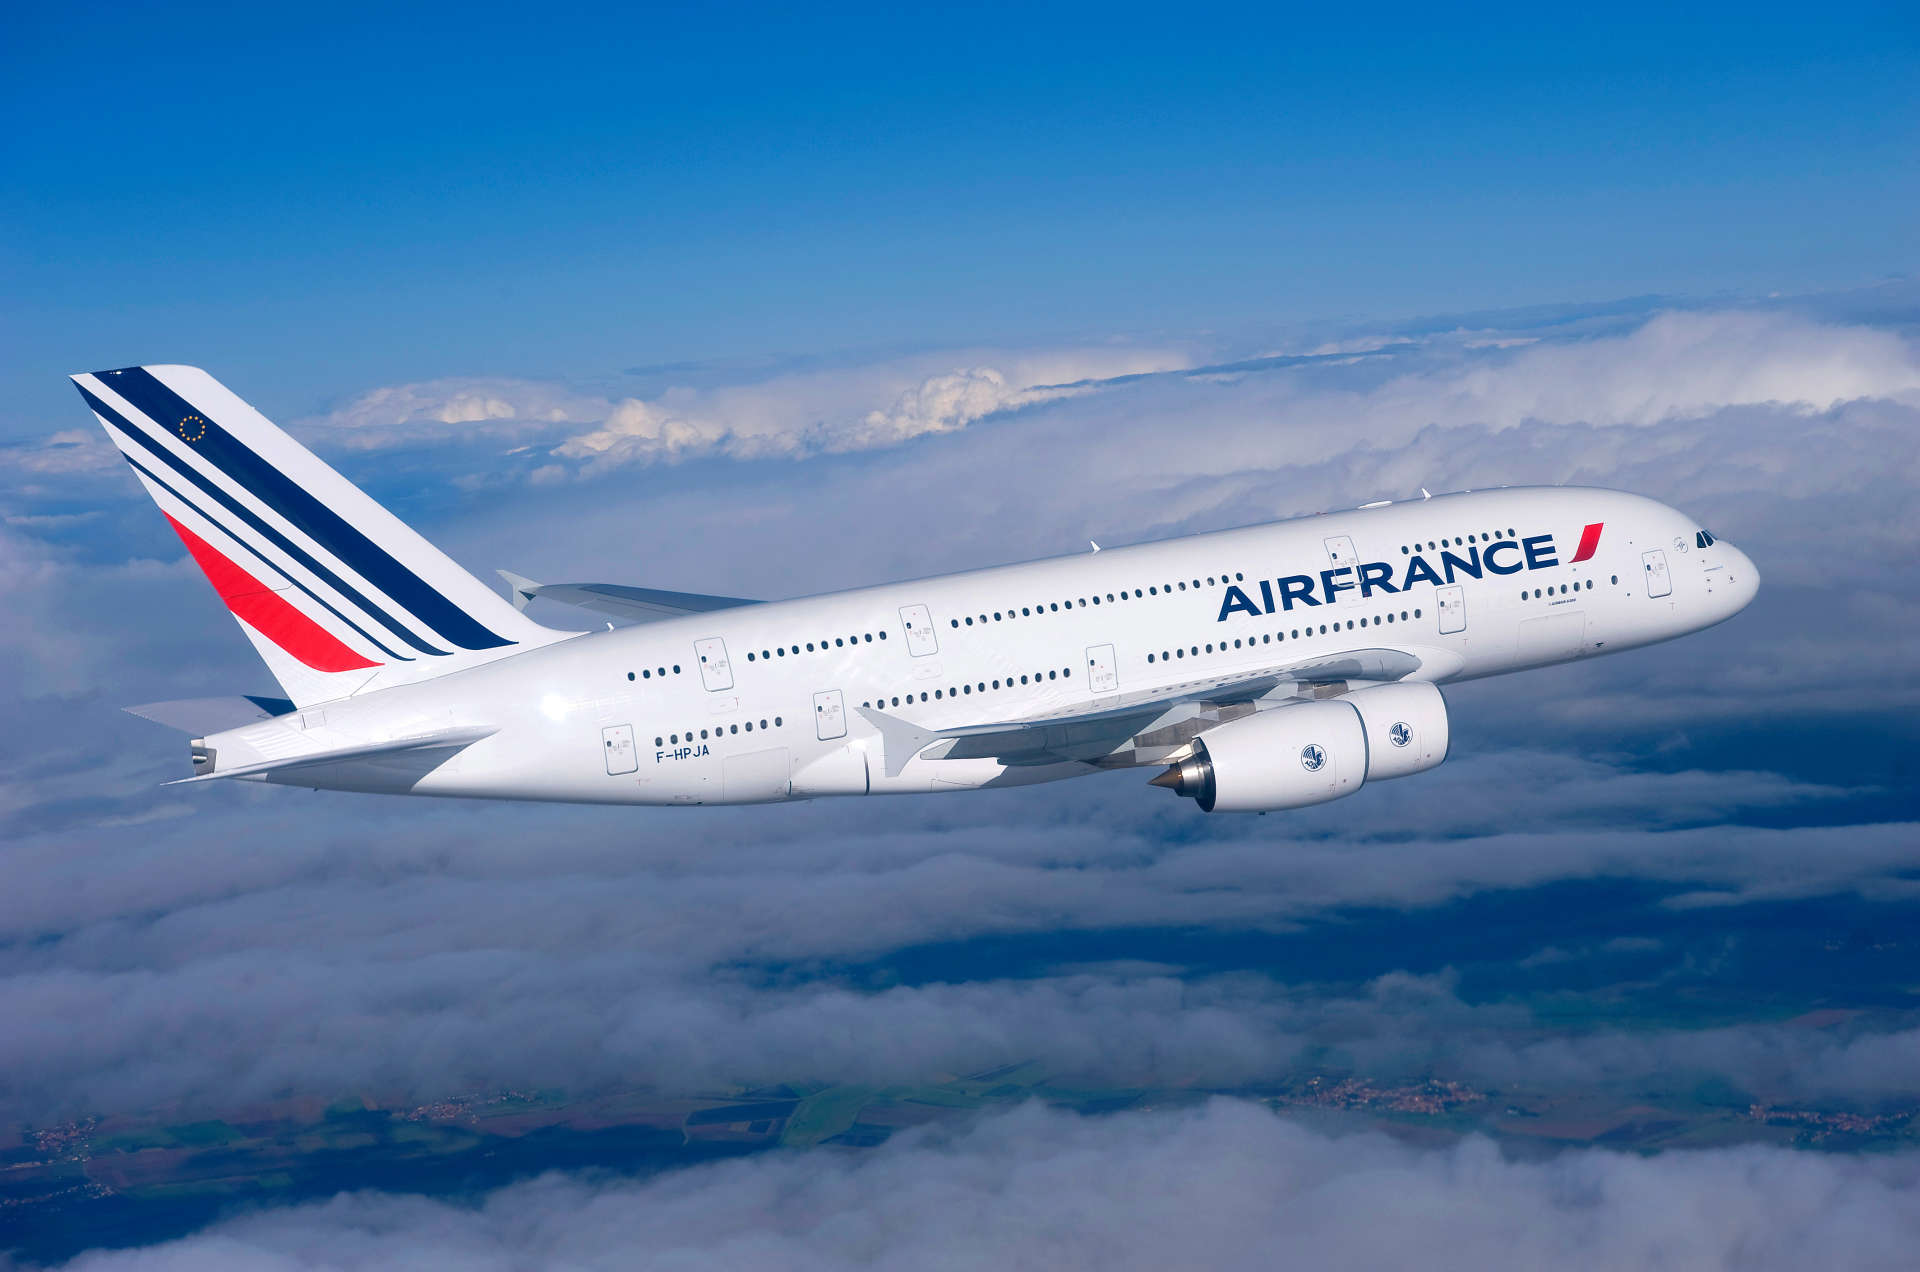 Air France Gewinnspiel 2019